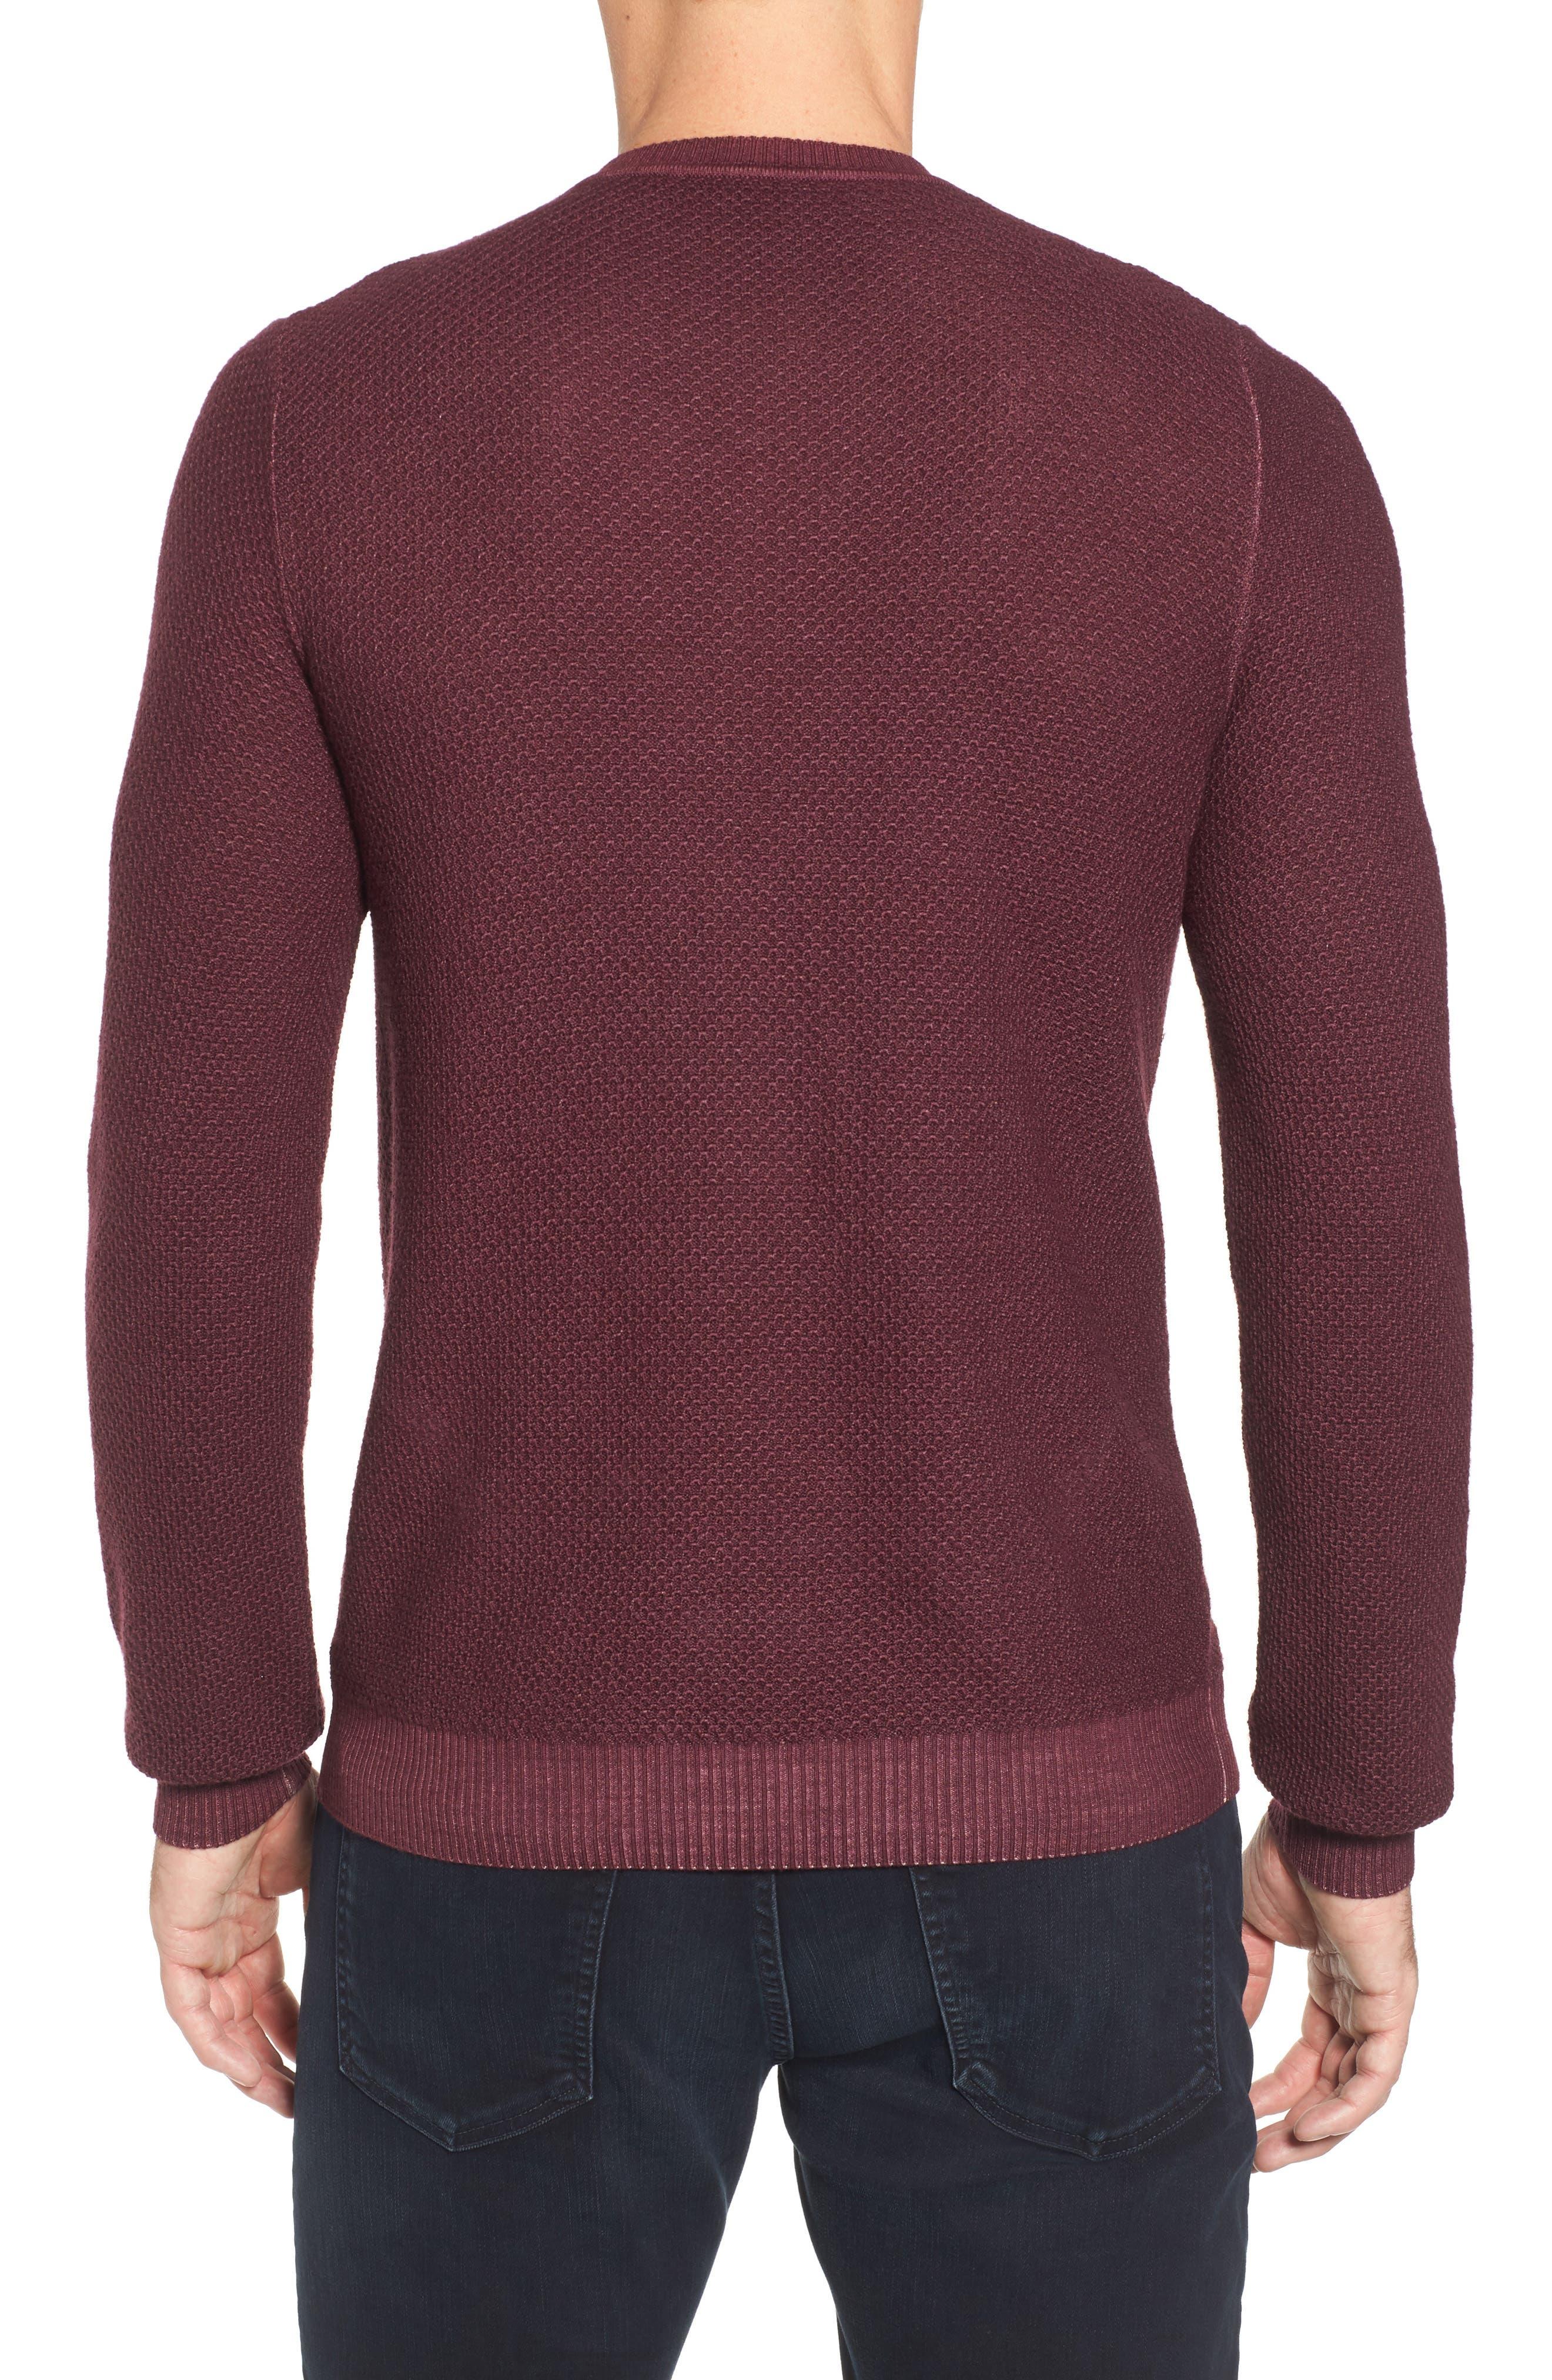 Honeycomb Merino Crewneck Sweater,                             Alternate thumbnail 2, color,                             Burgundy